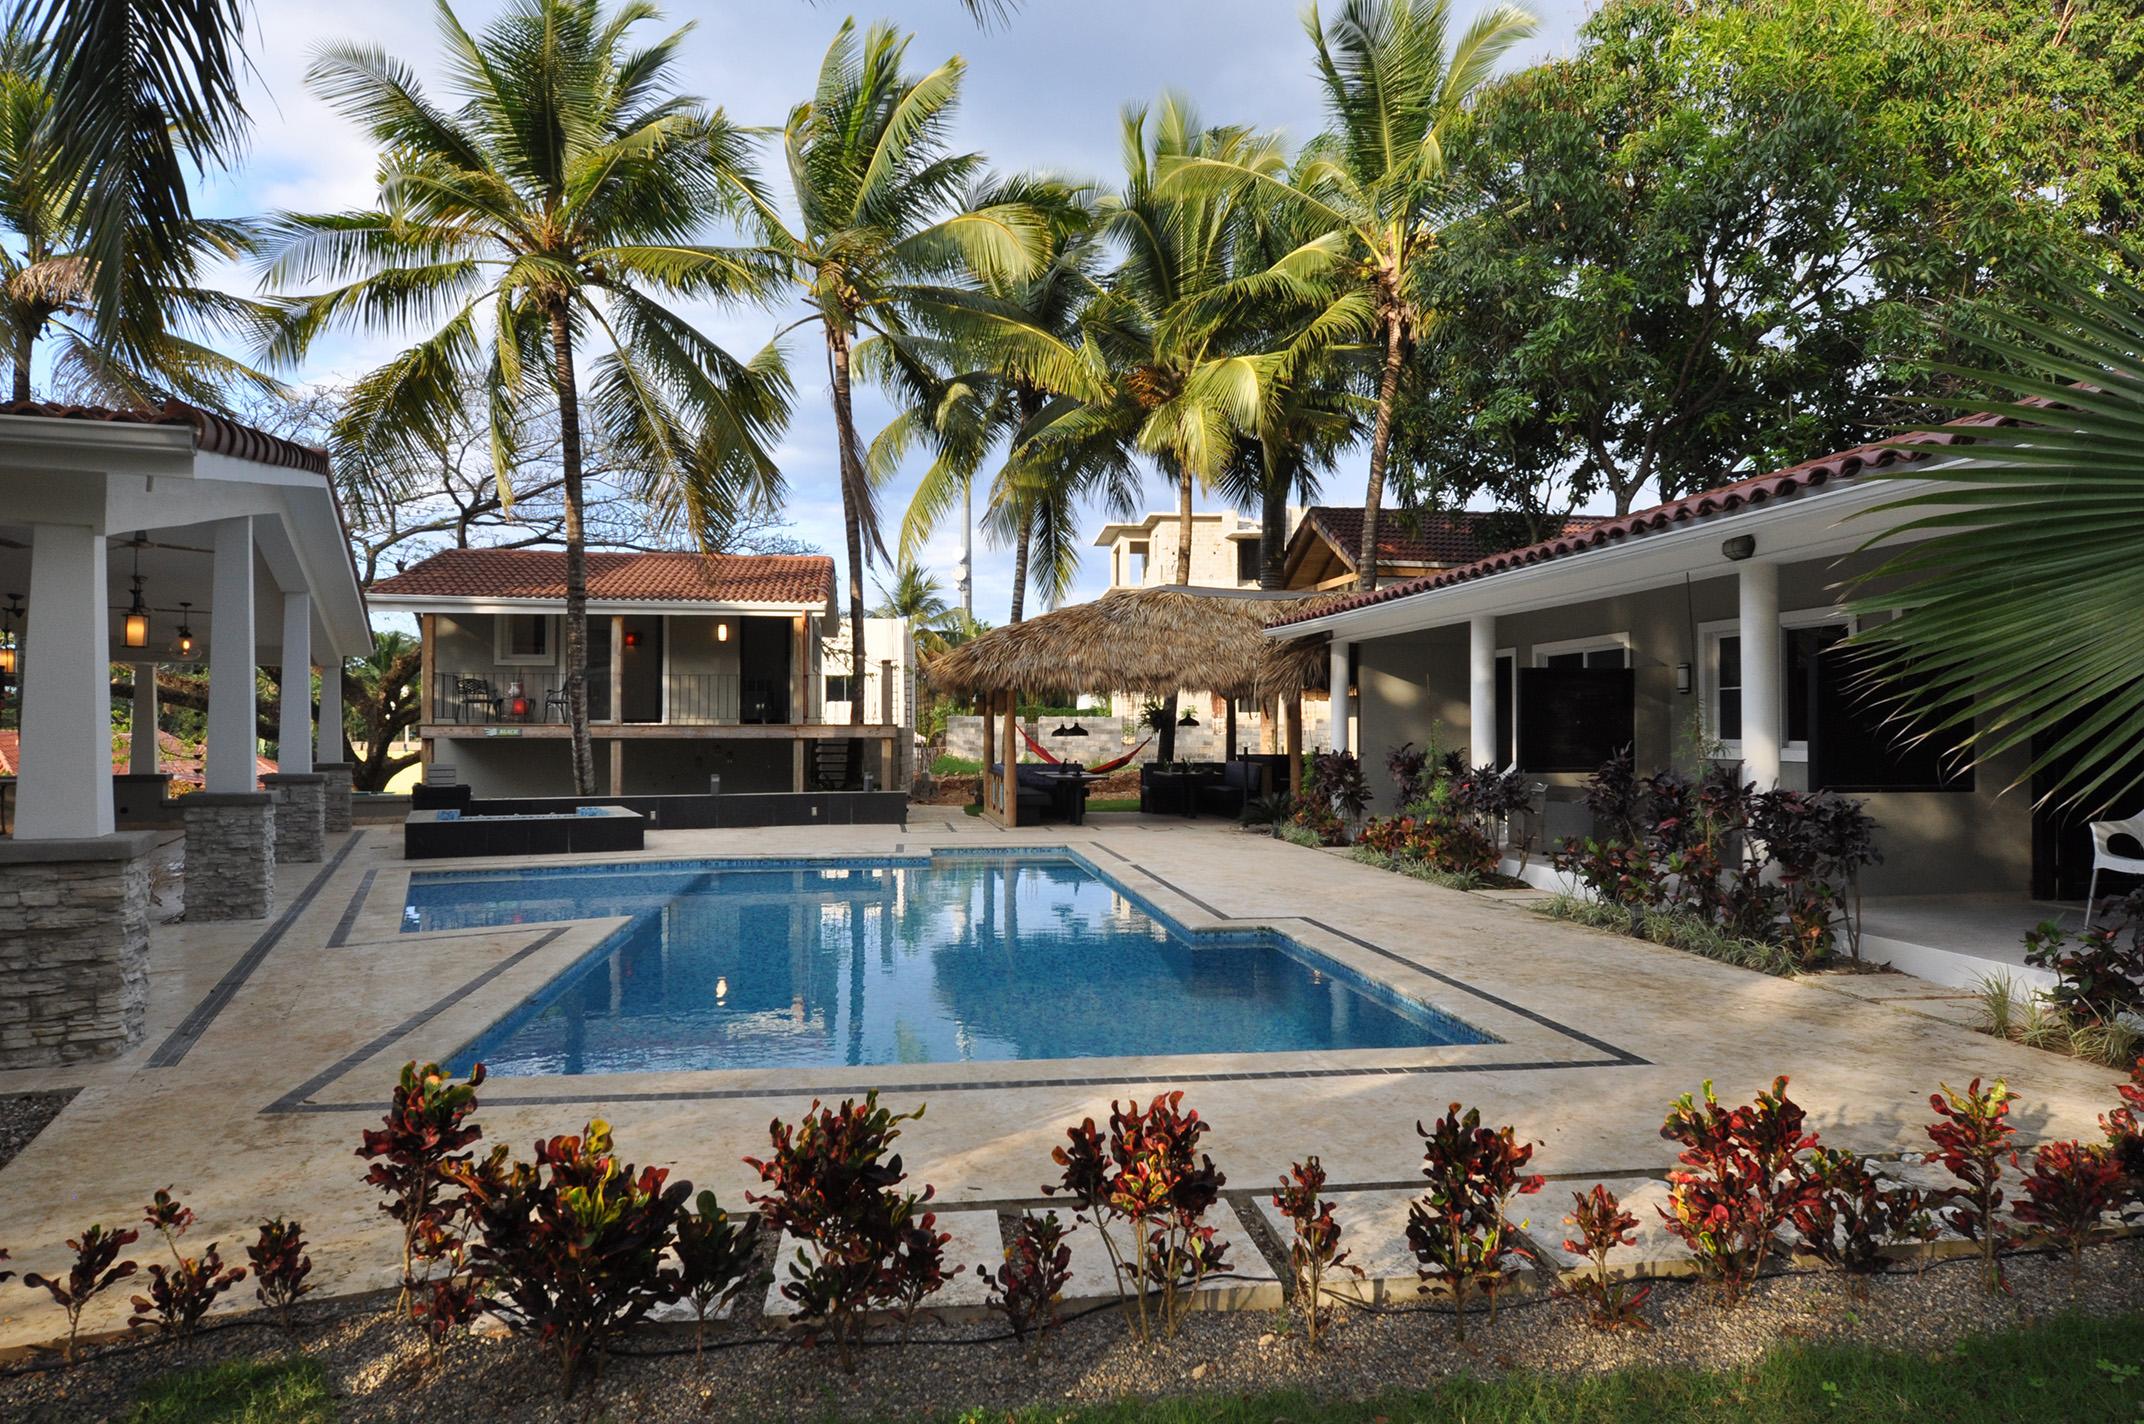 zu verkaufen hotel sosua puerto plata dominikanische republik calle maria montes 15. Black Bedroom Furniture Sets. Home Design Ideas